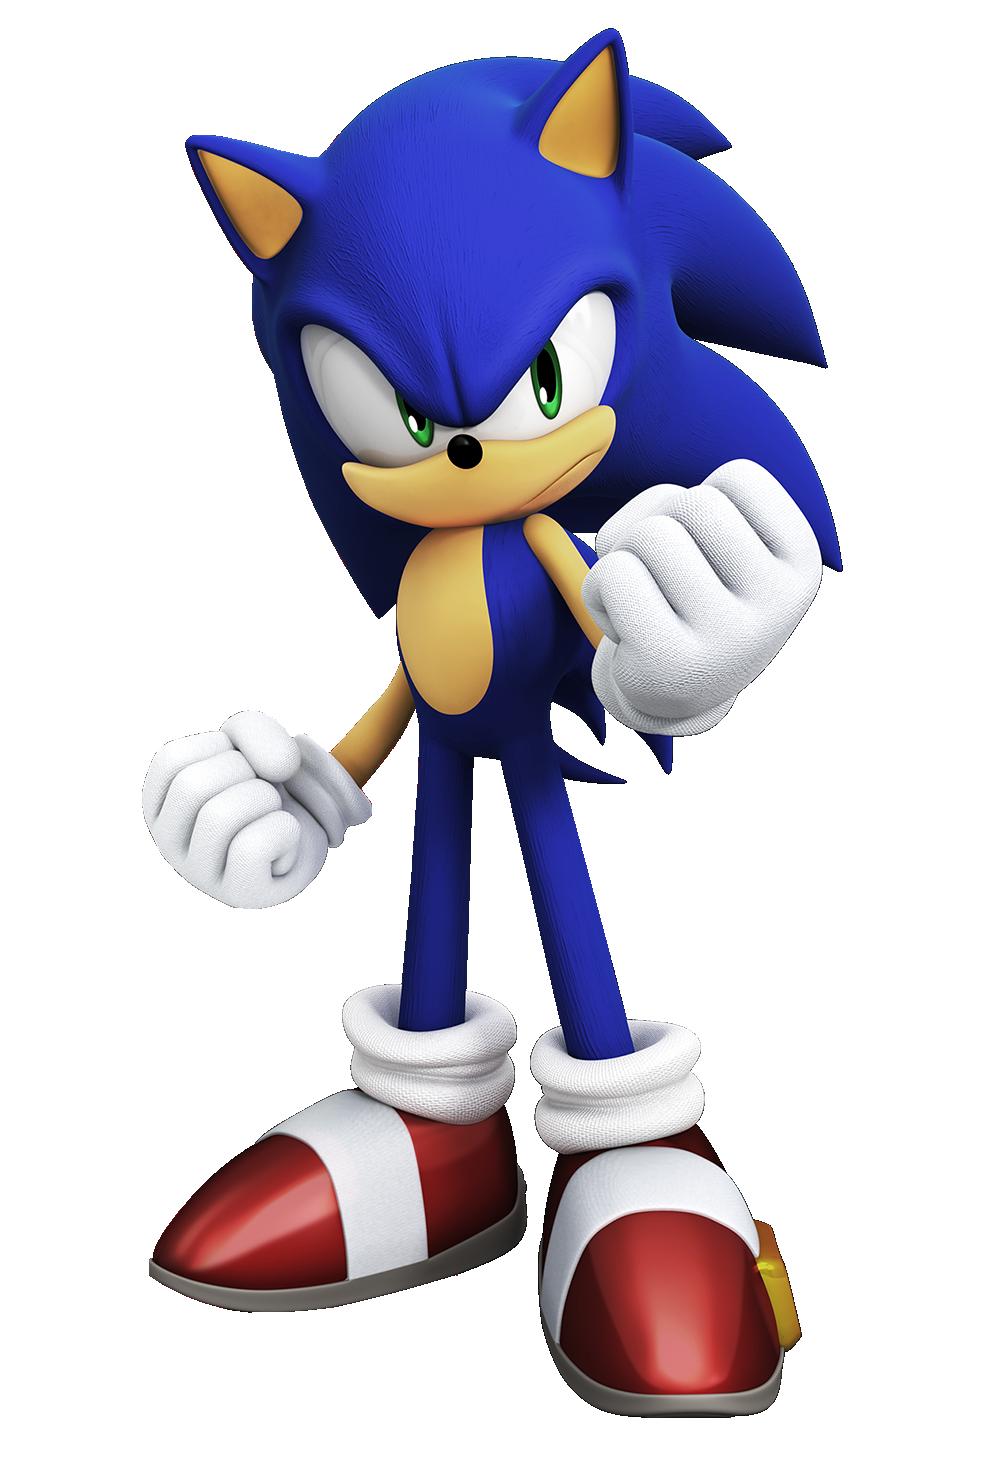 Sonic the hedgehog super mario wiki fandom powered by - Sonic et shadow ...